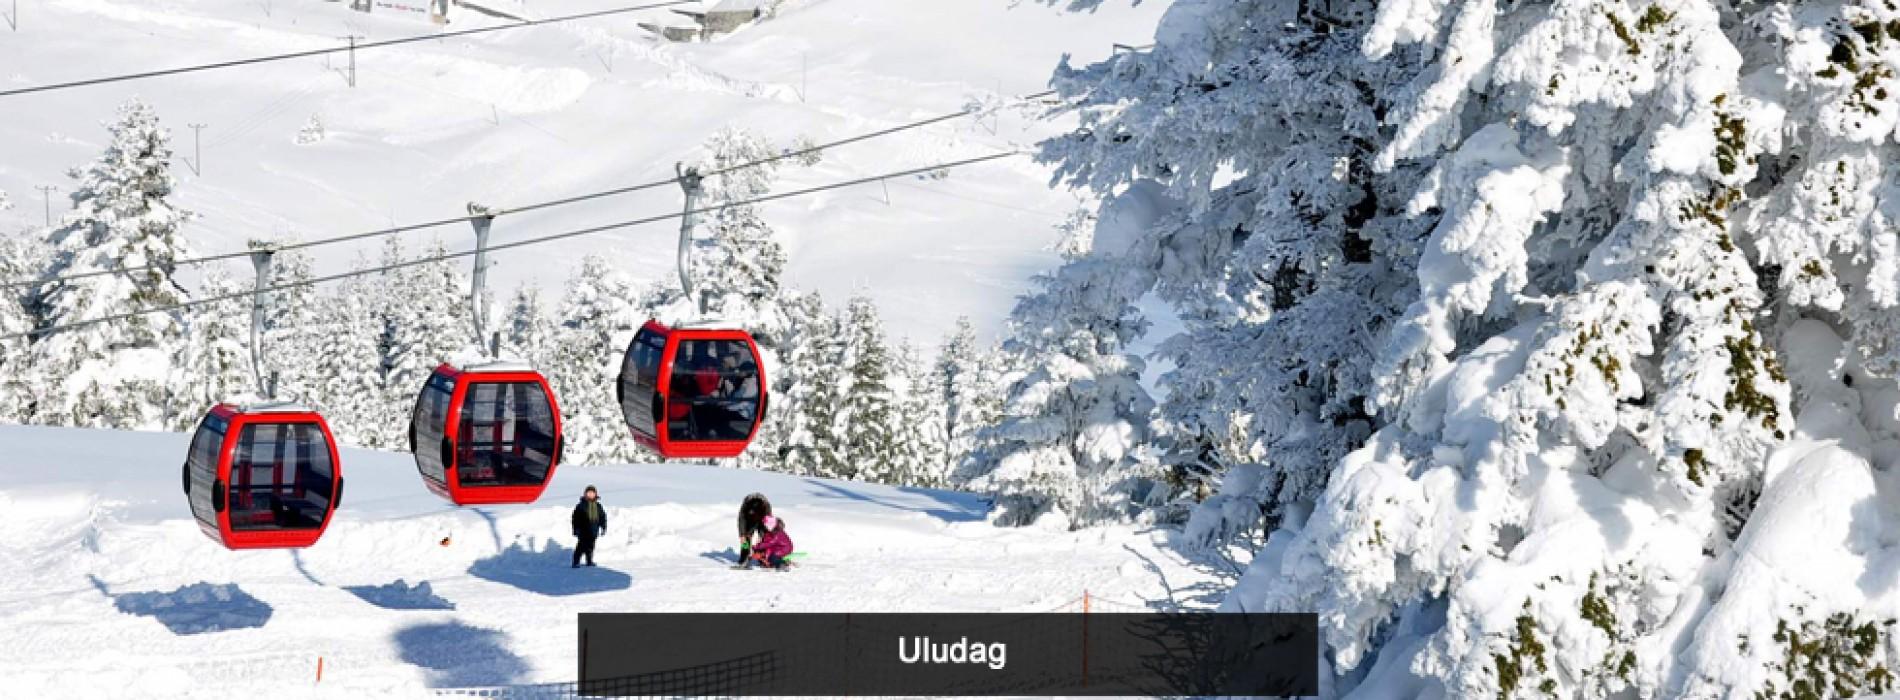 Popular Destinations to Visit in Turkey During Winter